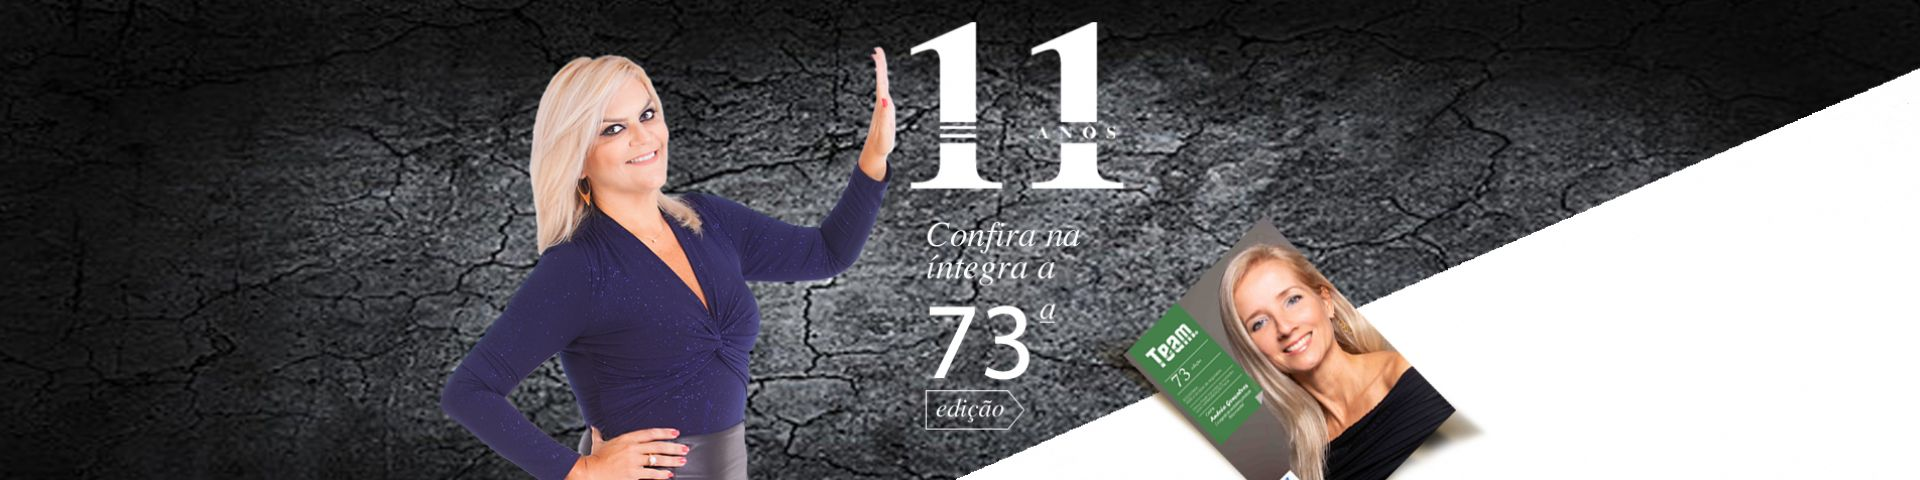 Revista Team 73ª